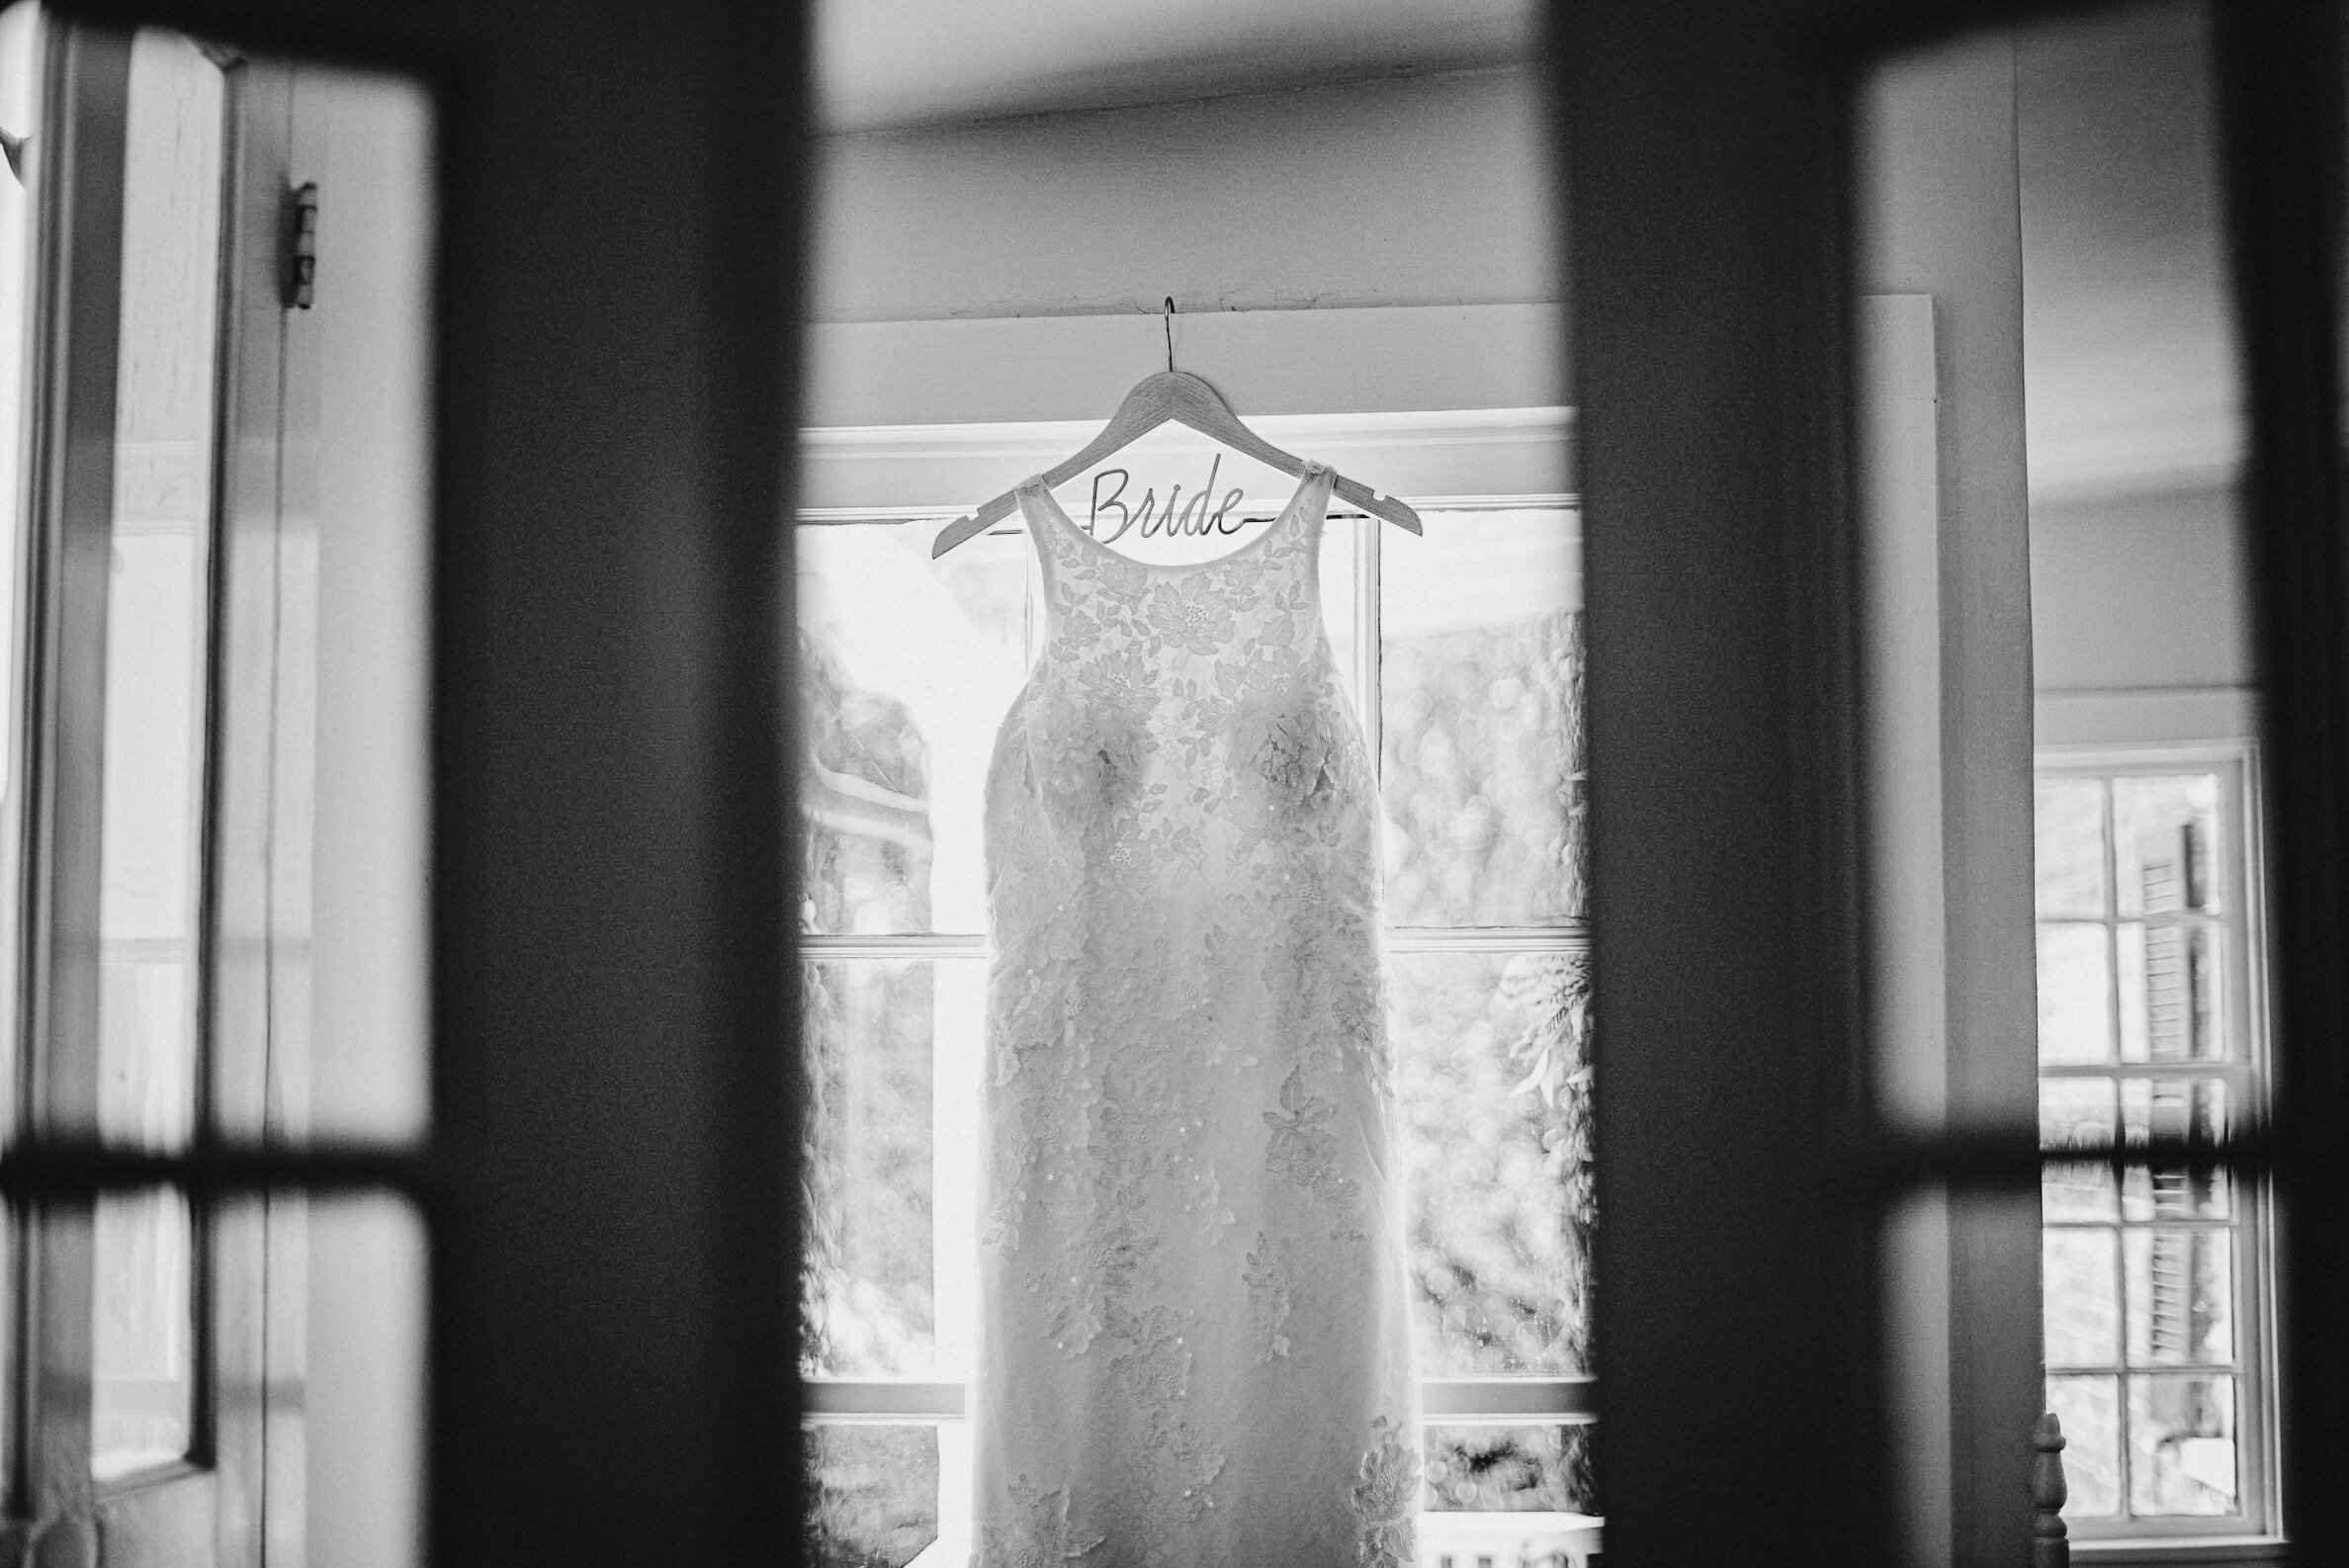 Detail shot of wedding dress at Birkby House